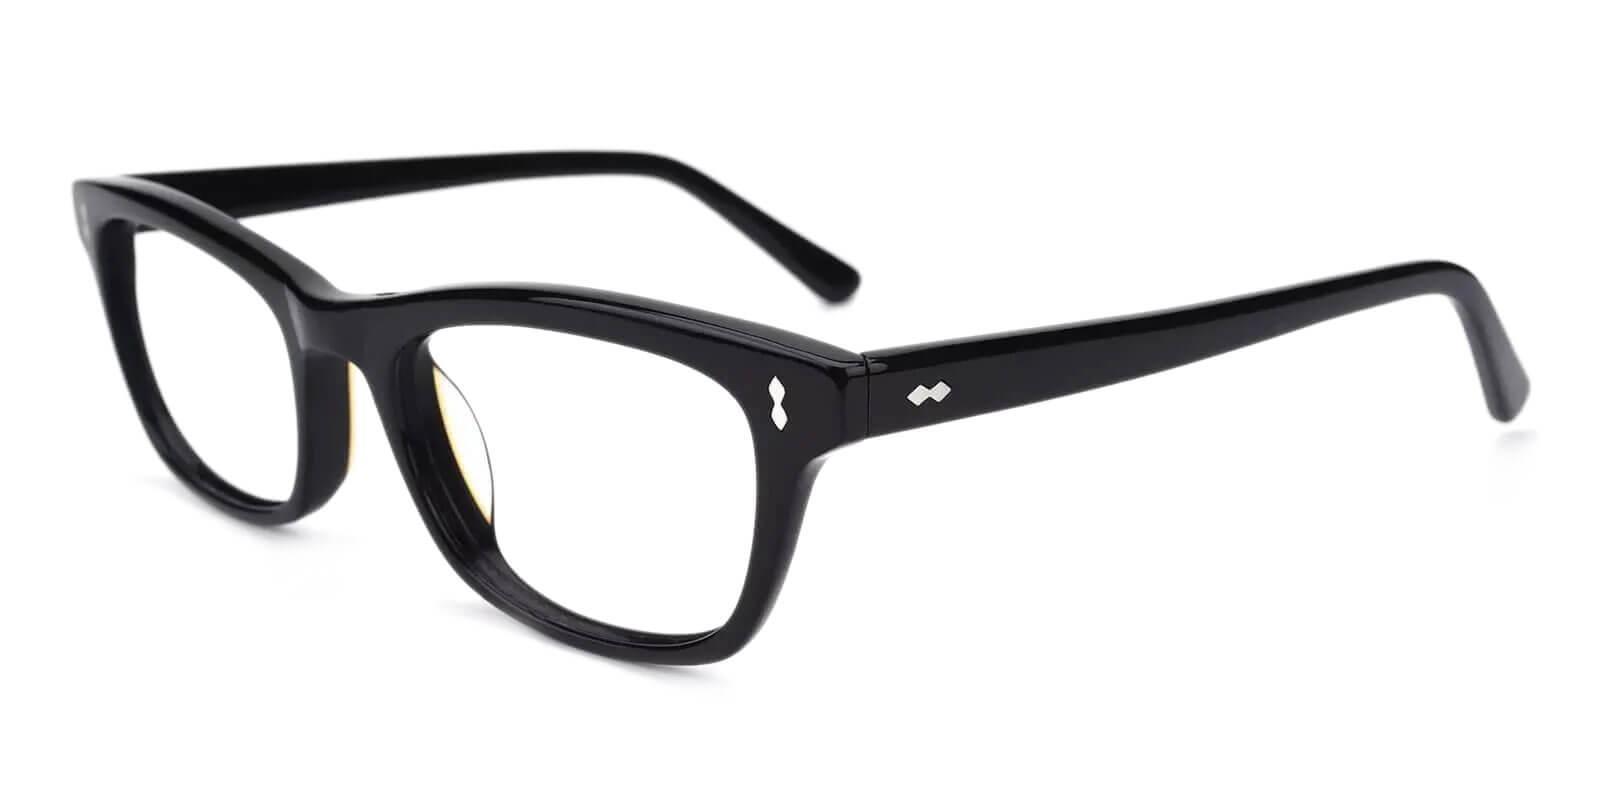 Leaf Black Acetate Eyeglasses , UniversalBridgeFit Frames from ABBE Glasses